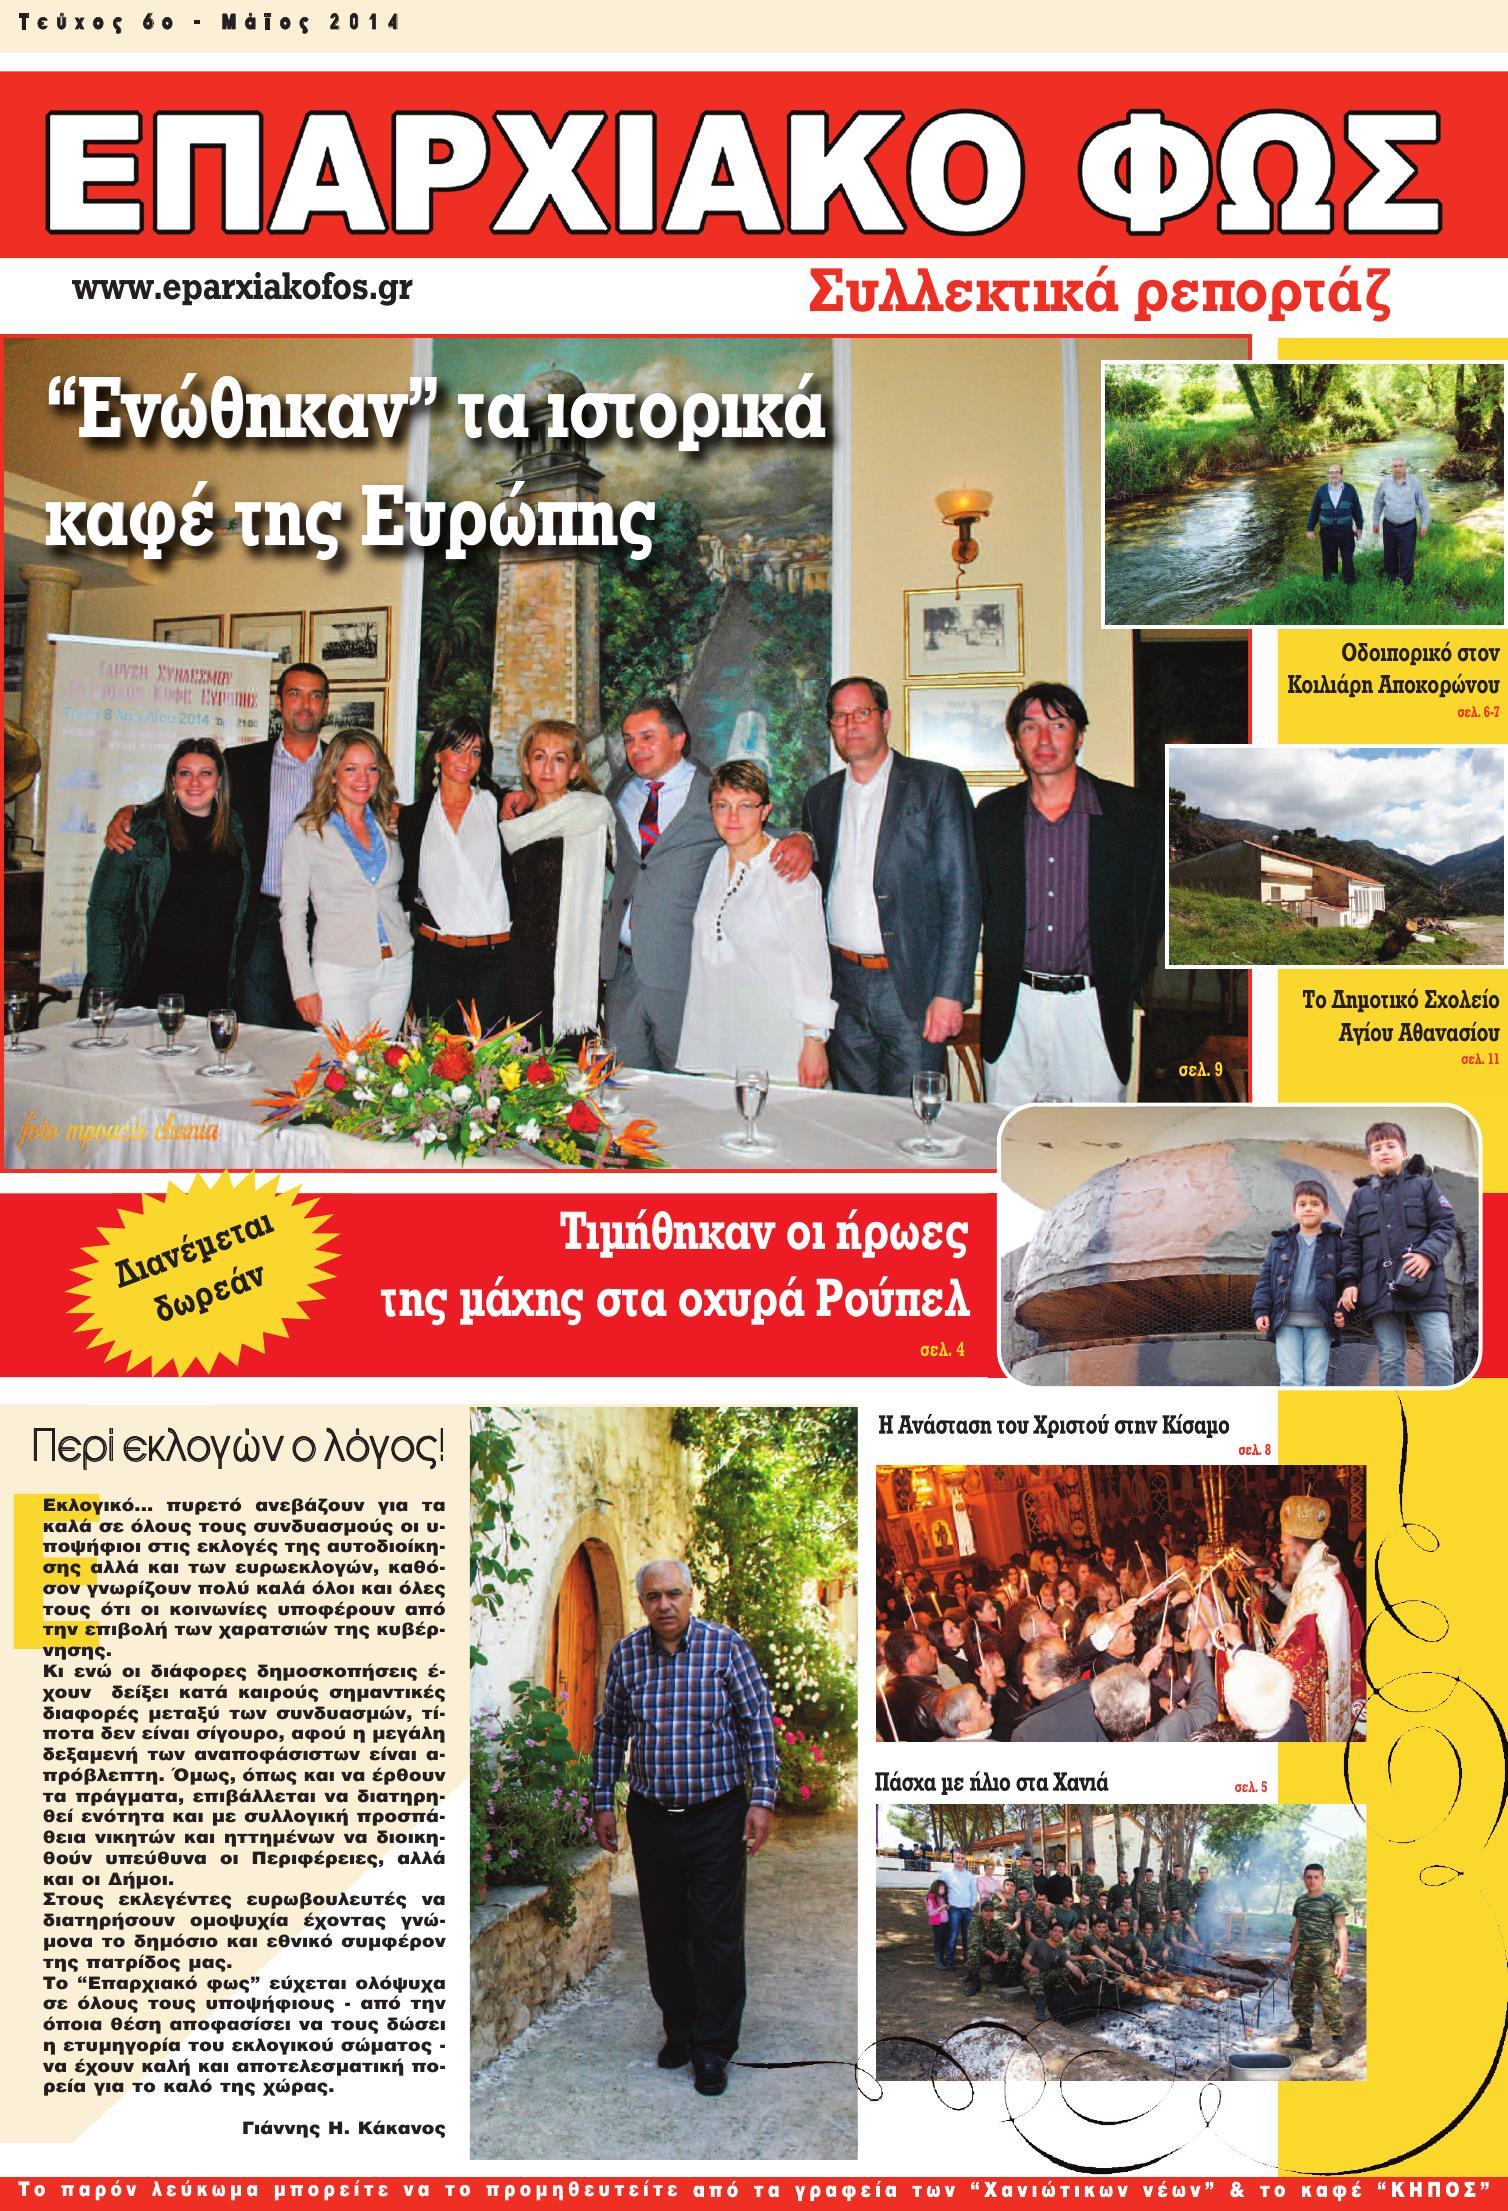 06 kakanos leukoma (Page 01)